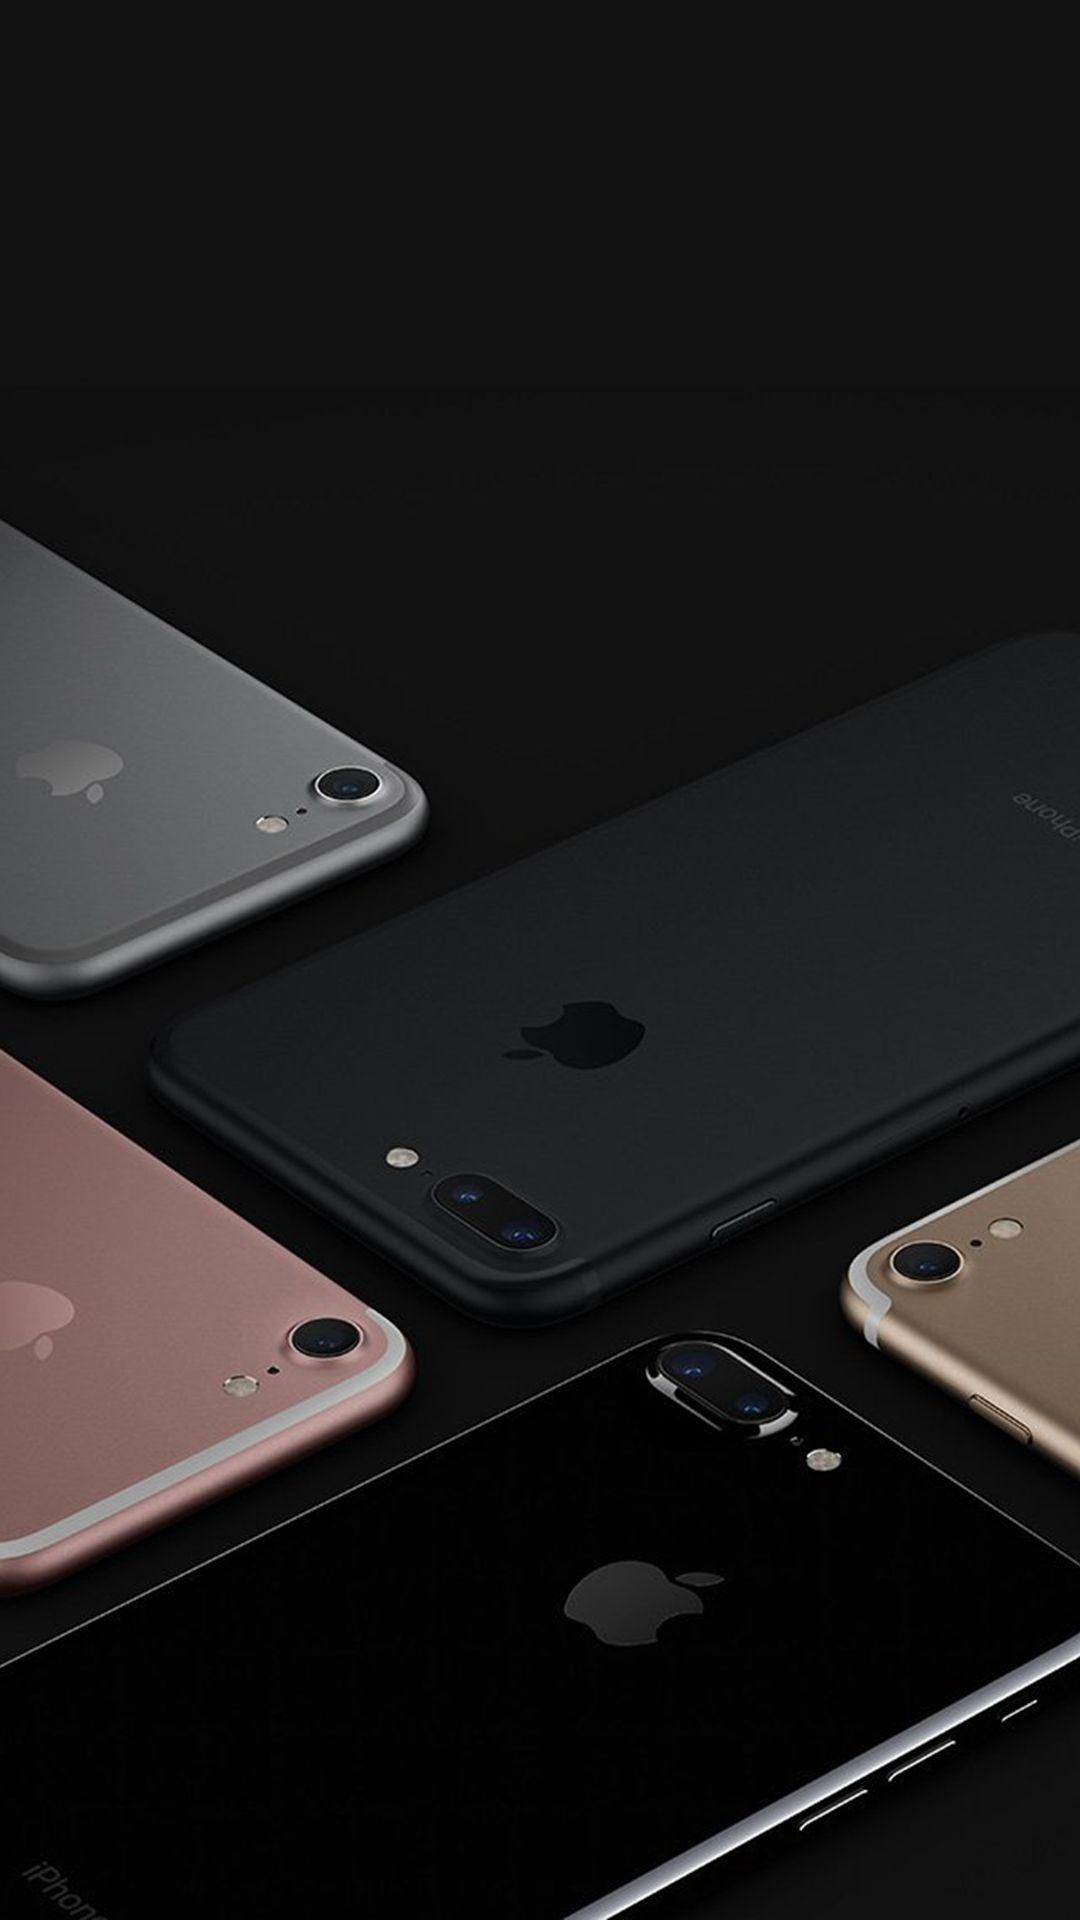 Wallpaper iphone jet black - Apple Iphone7 Jetblack Gold Pink Silver Dark Ios10 Art Illustration Iphone 6 Plus